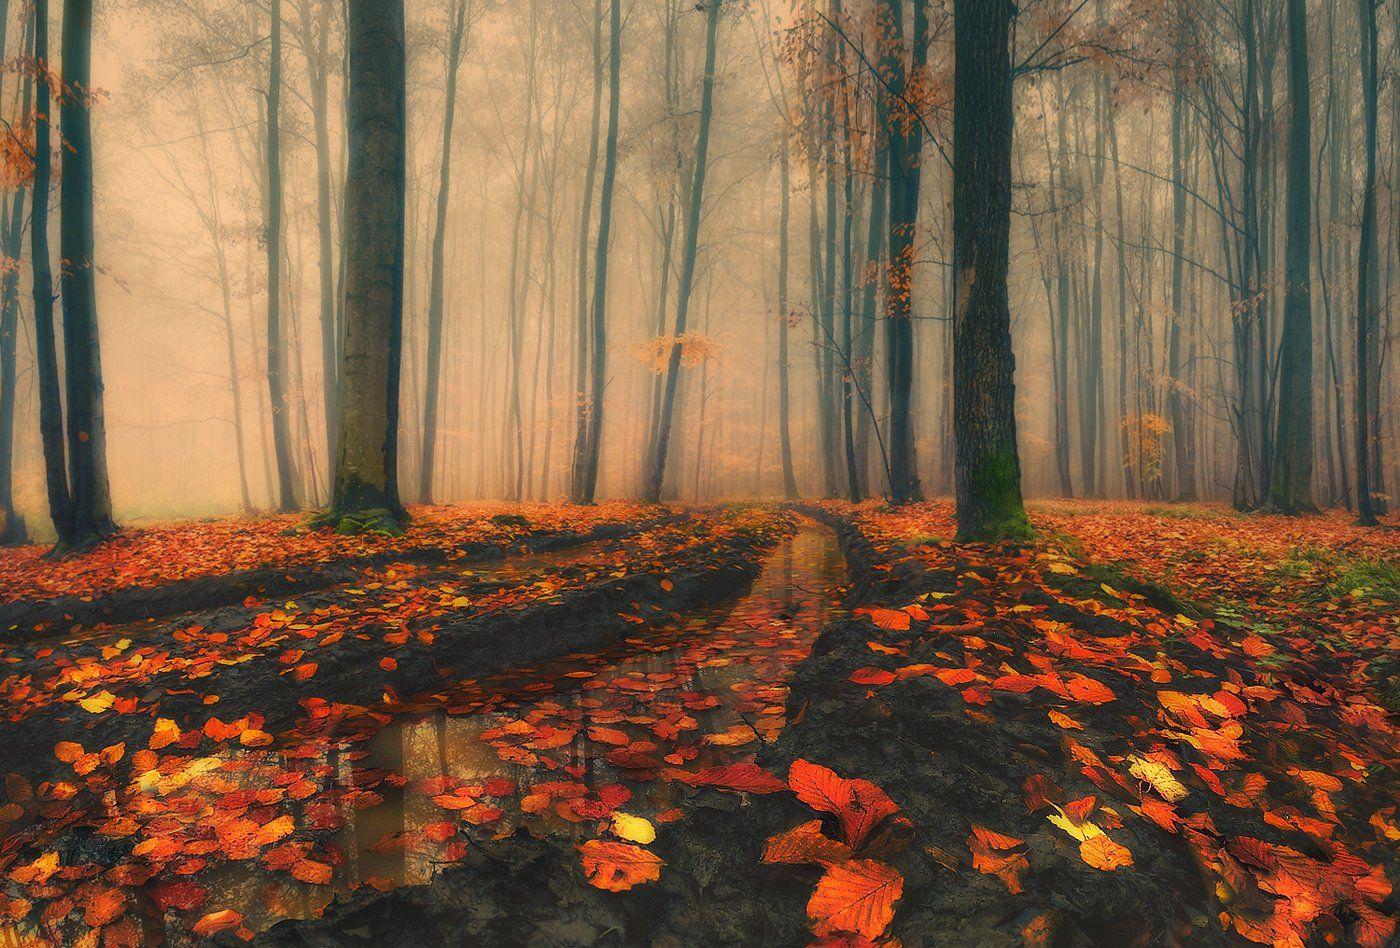 дорога, лес, листопад, осень, туман, Владимир